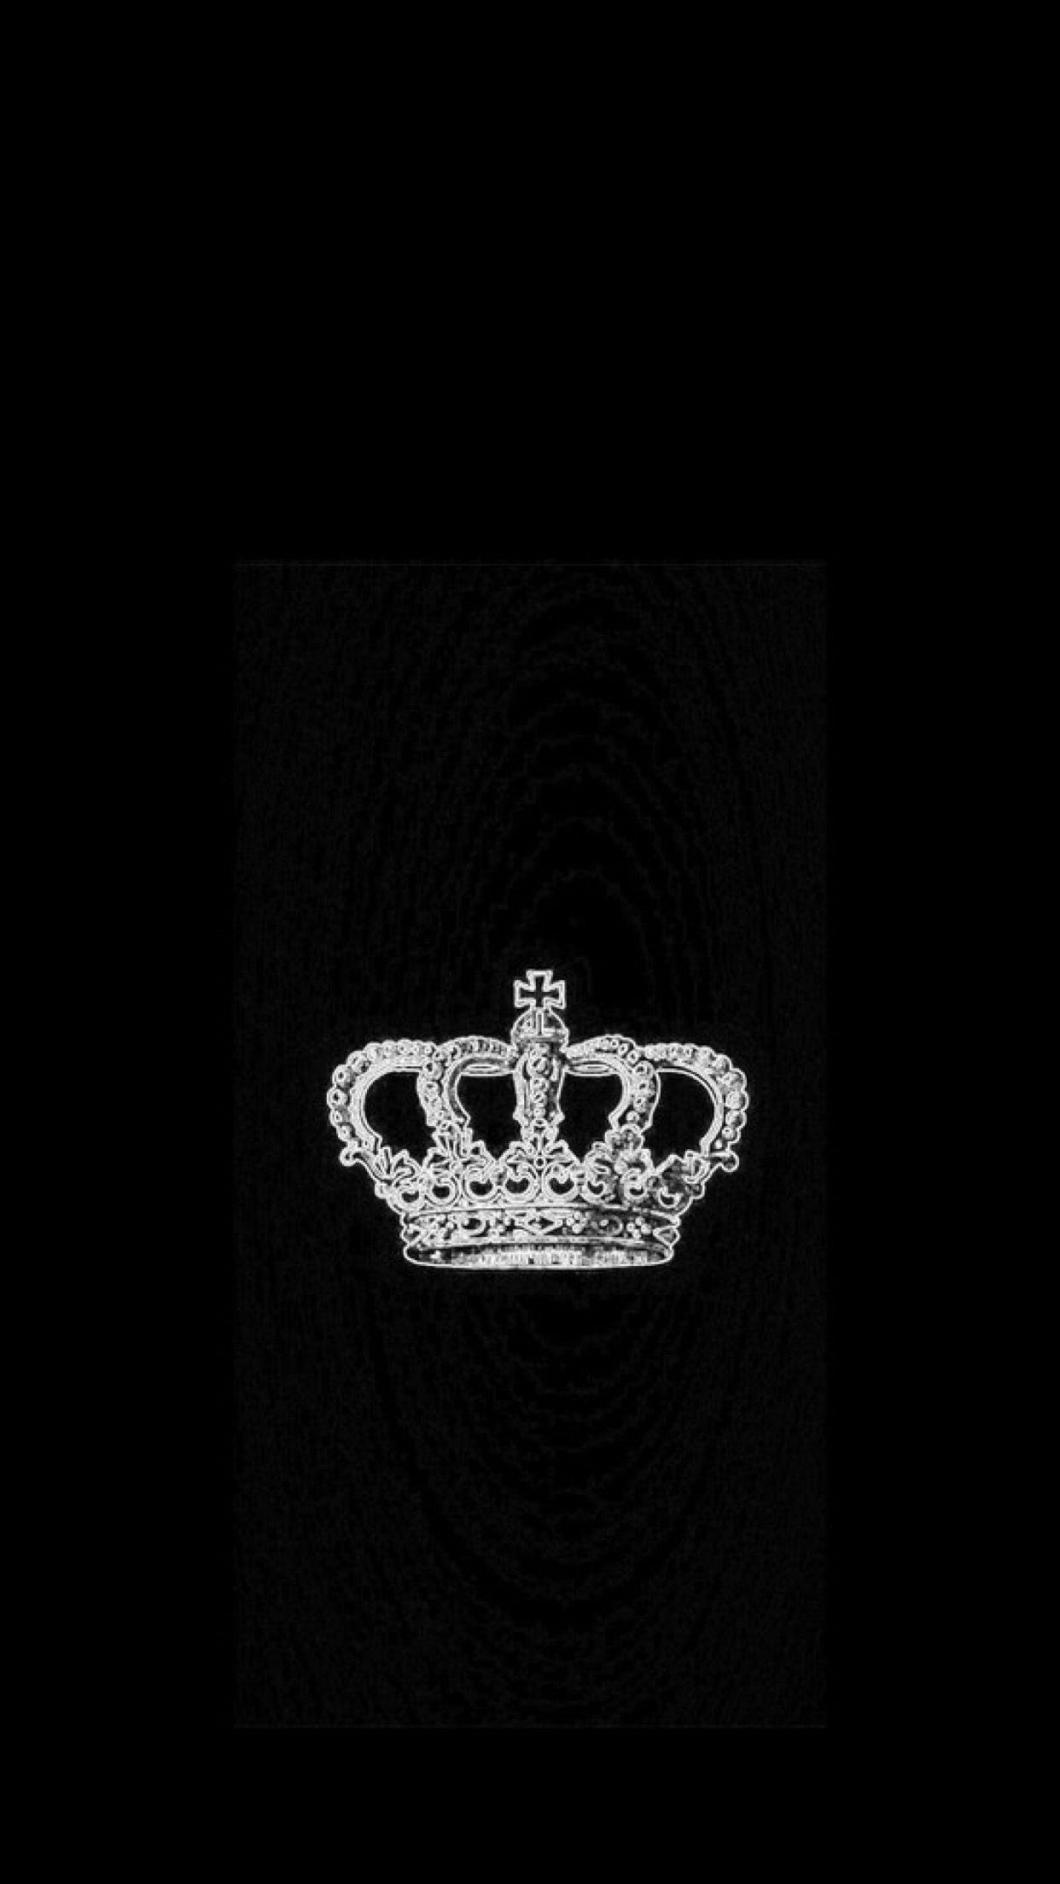 King Crown Wallpapers Hd For Desktop Wallpaper Cave